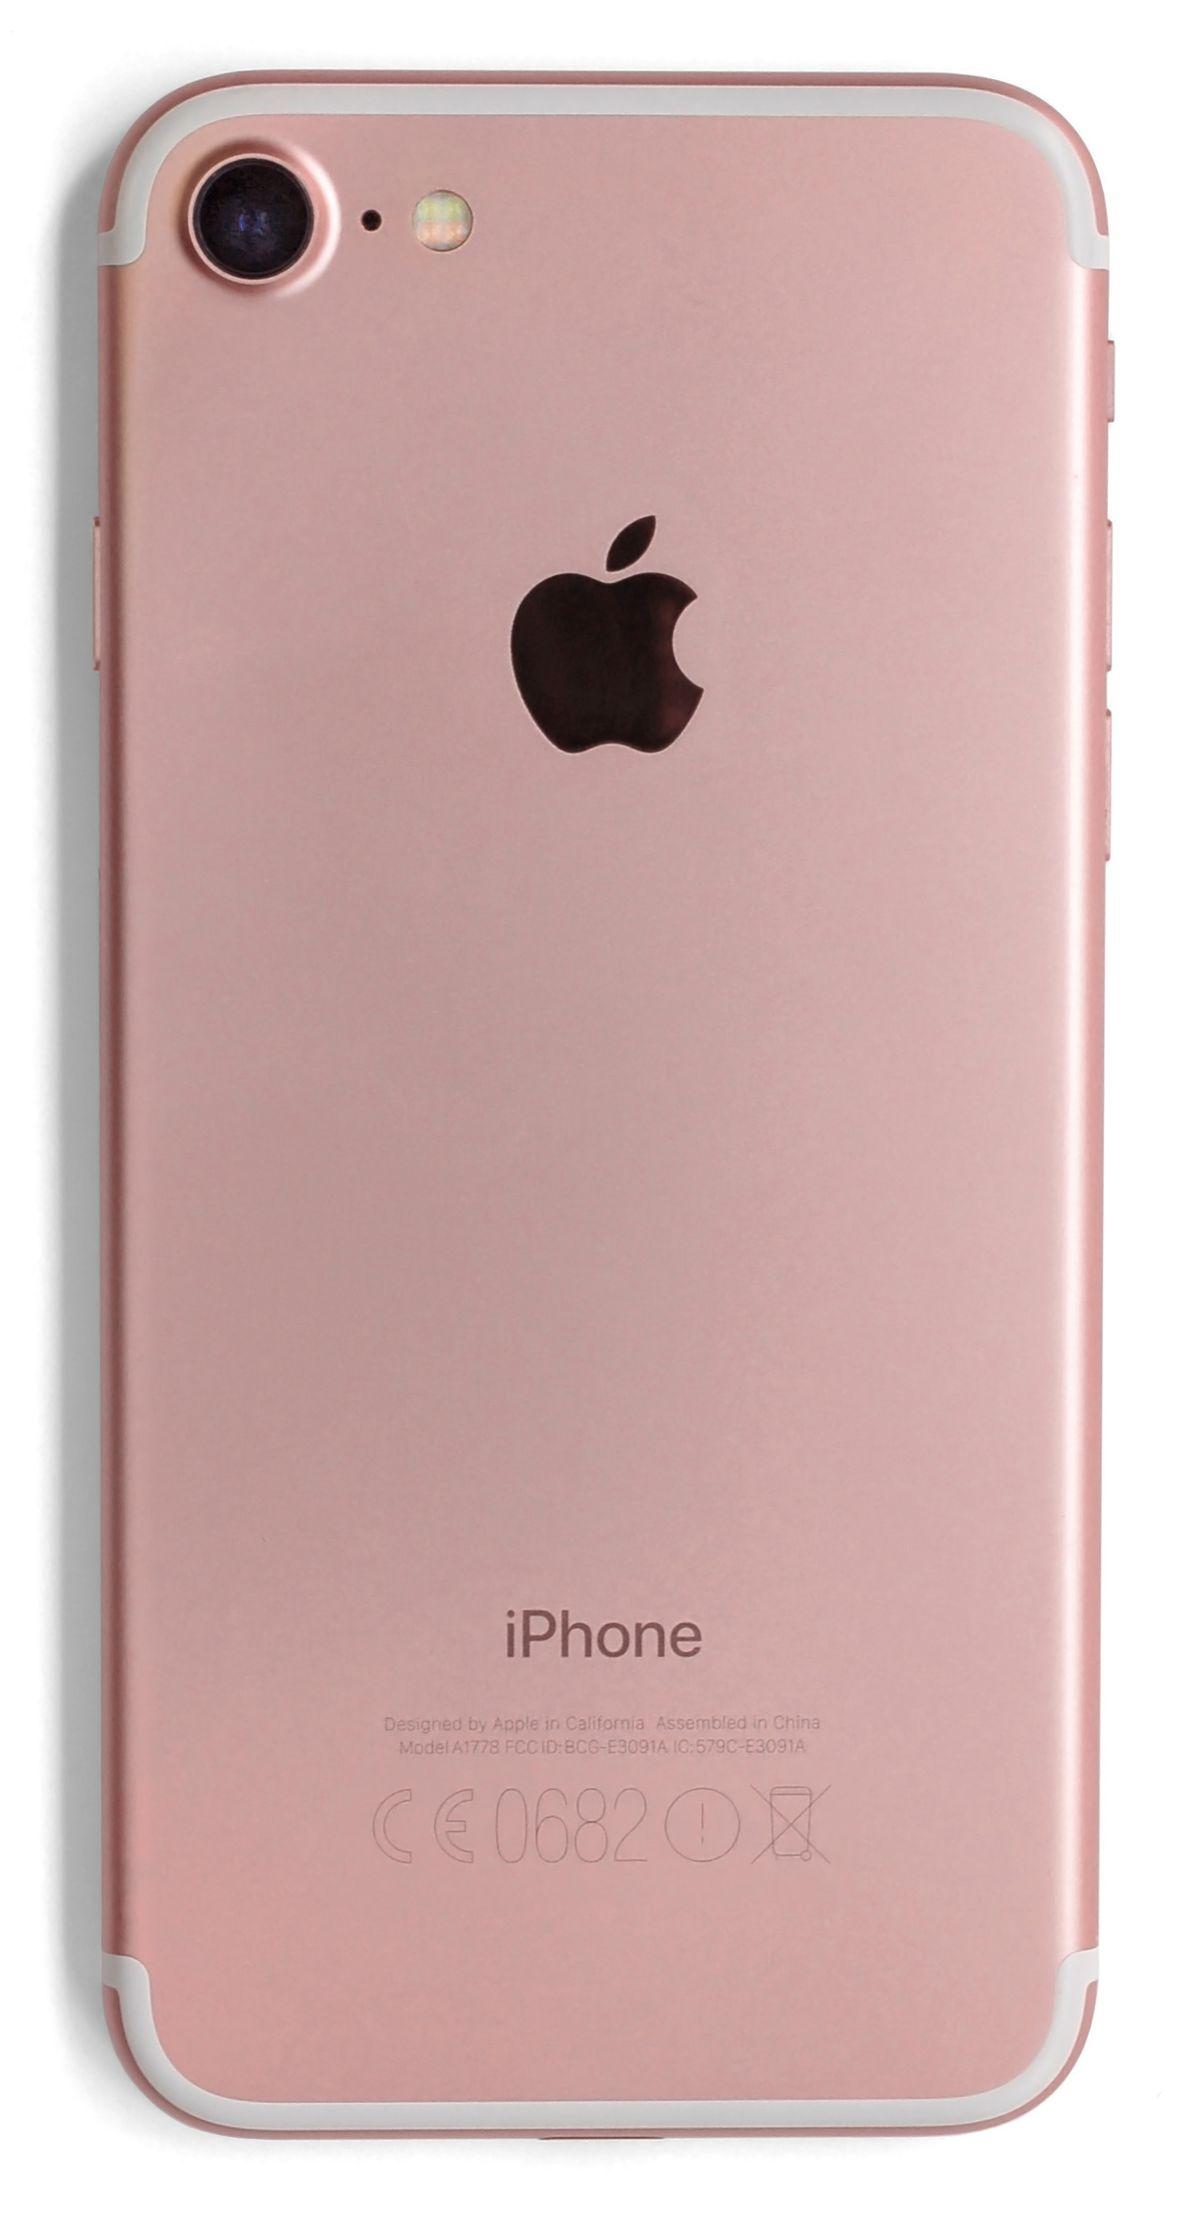 Iphone S Rosa Milanuncios